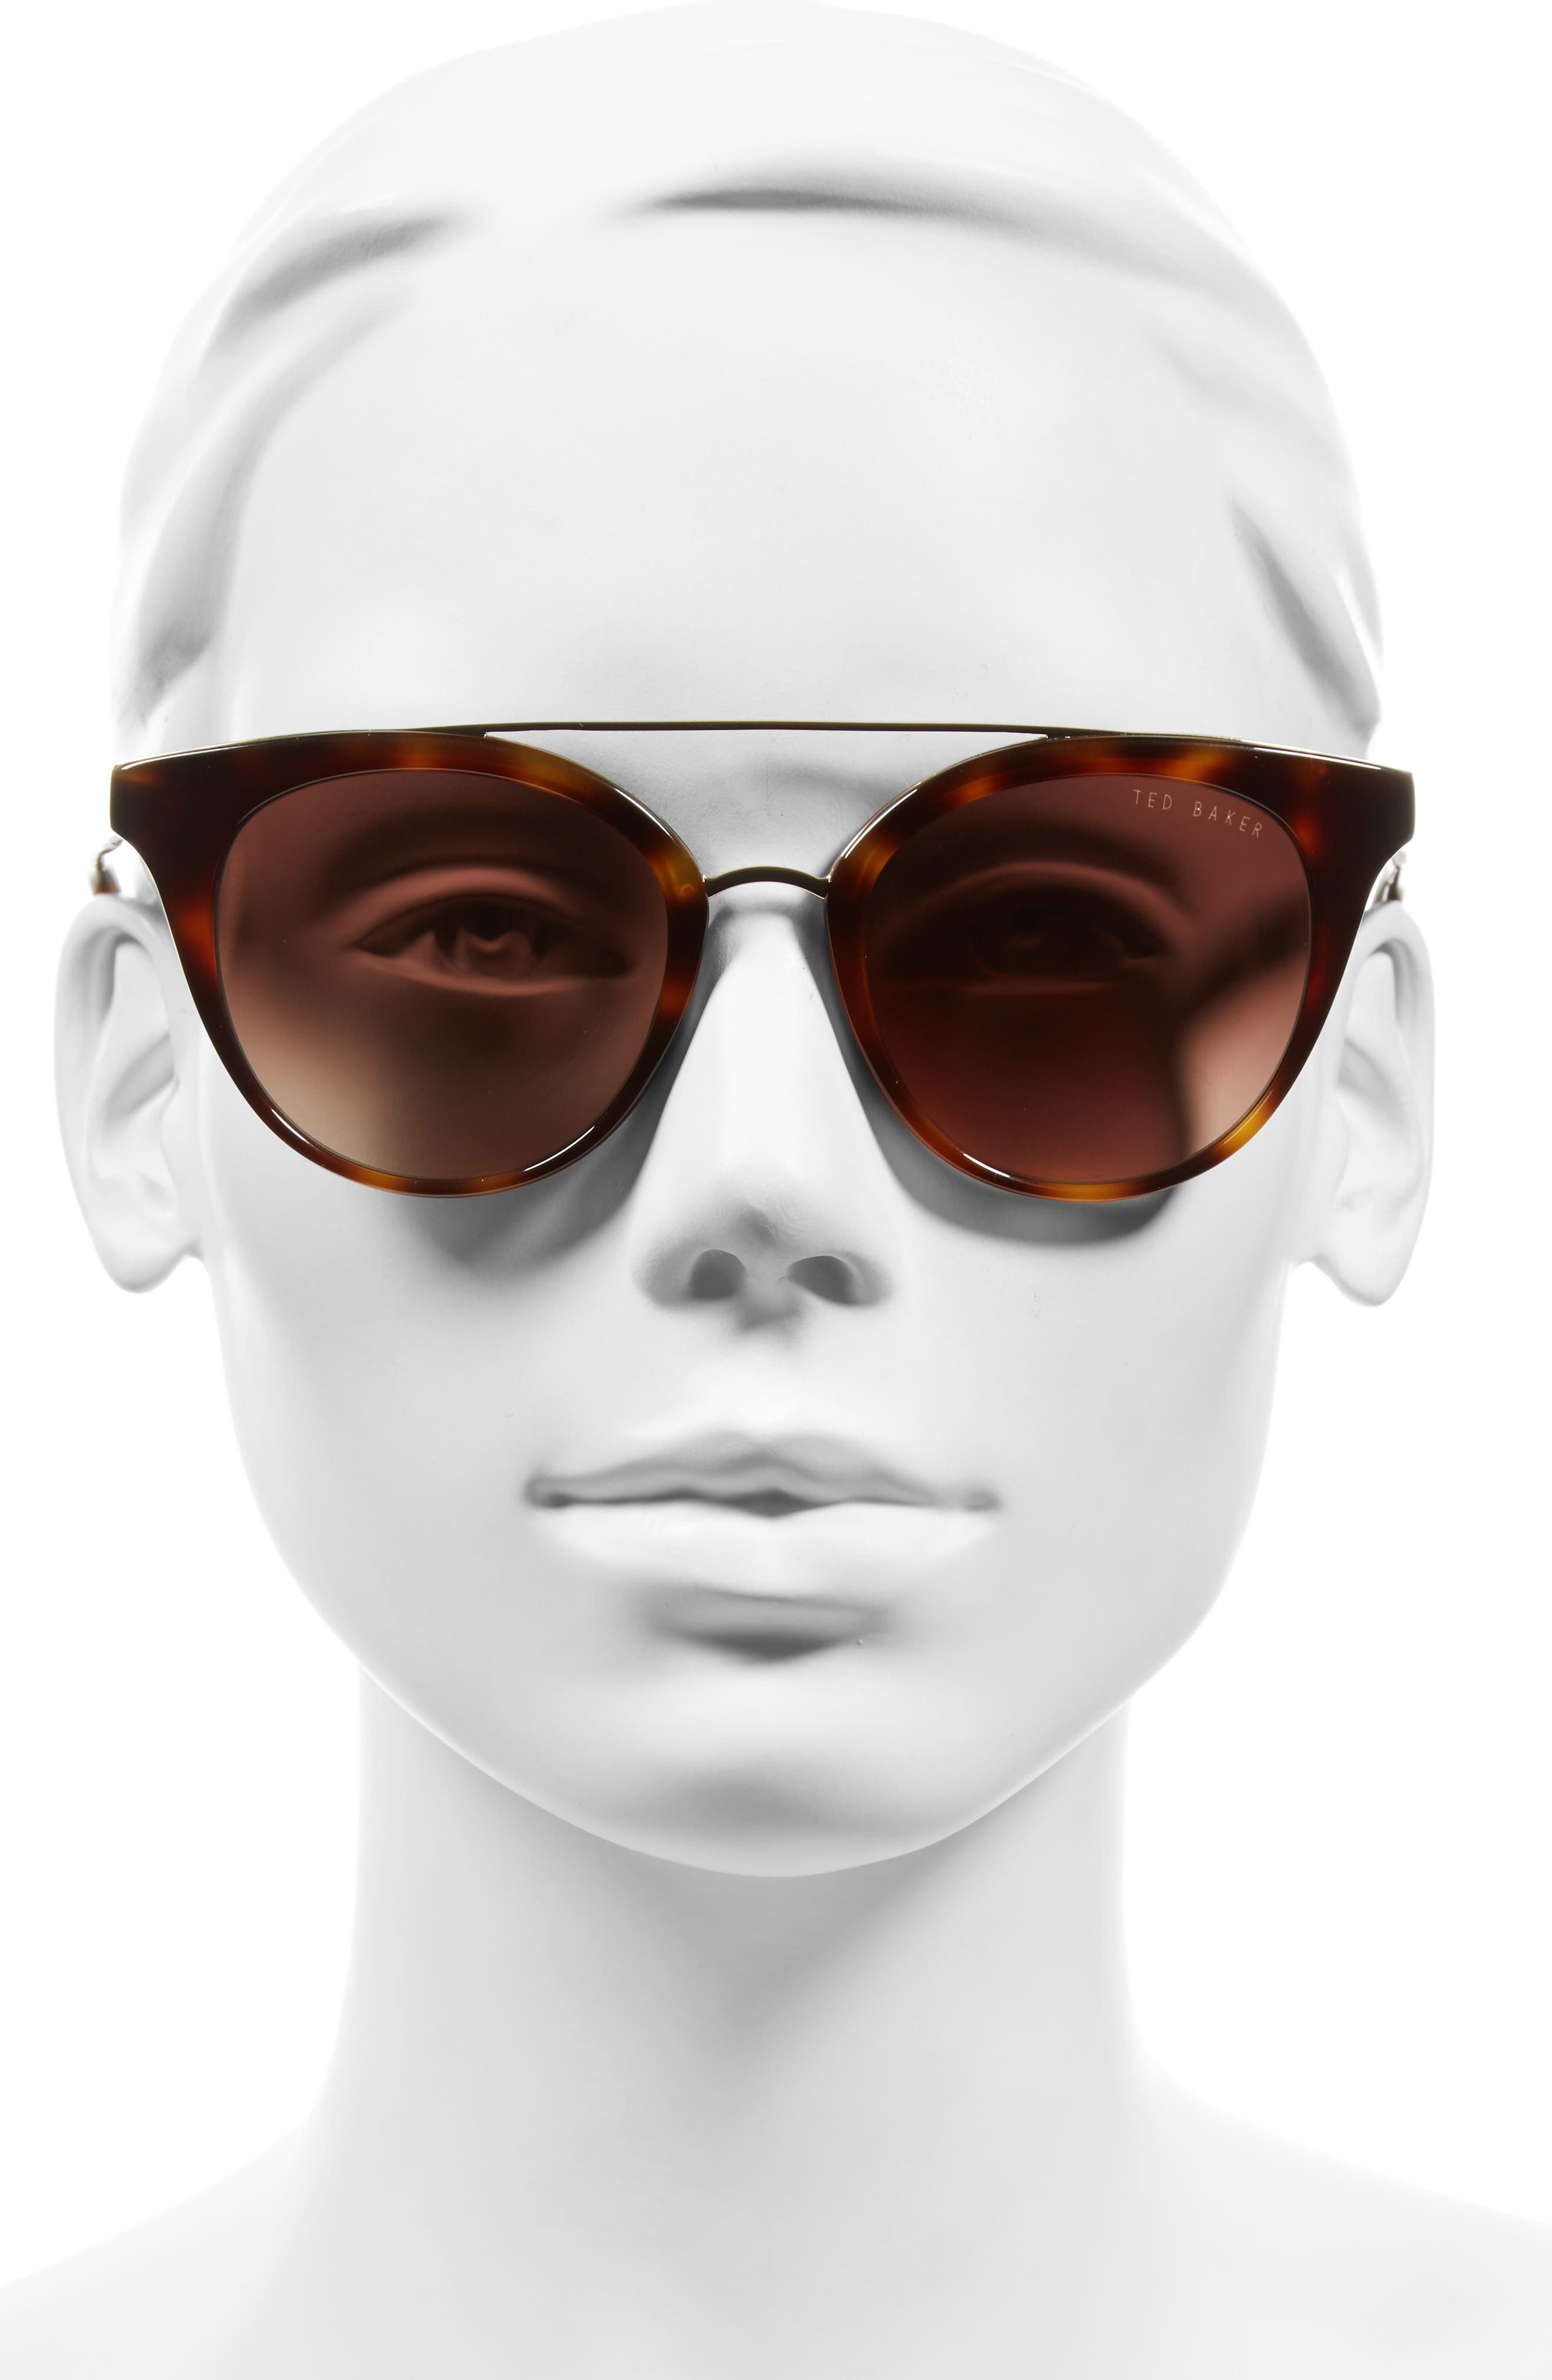 51mm Gradient Lens Round Retro Sunglasses,                             Alternate thumbnail 2, color,                             Tortoise